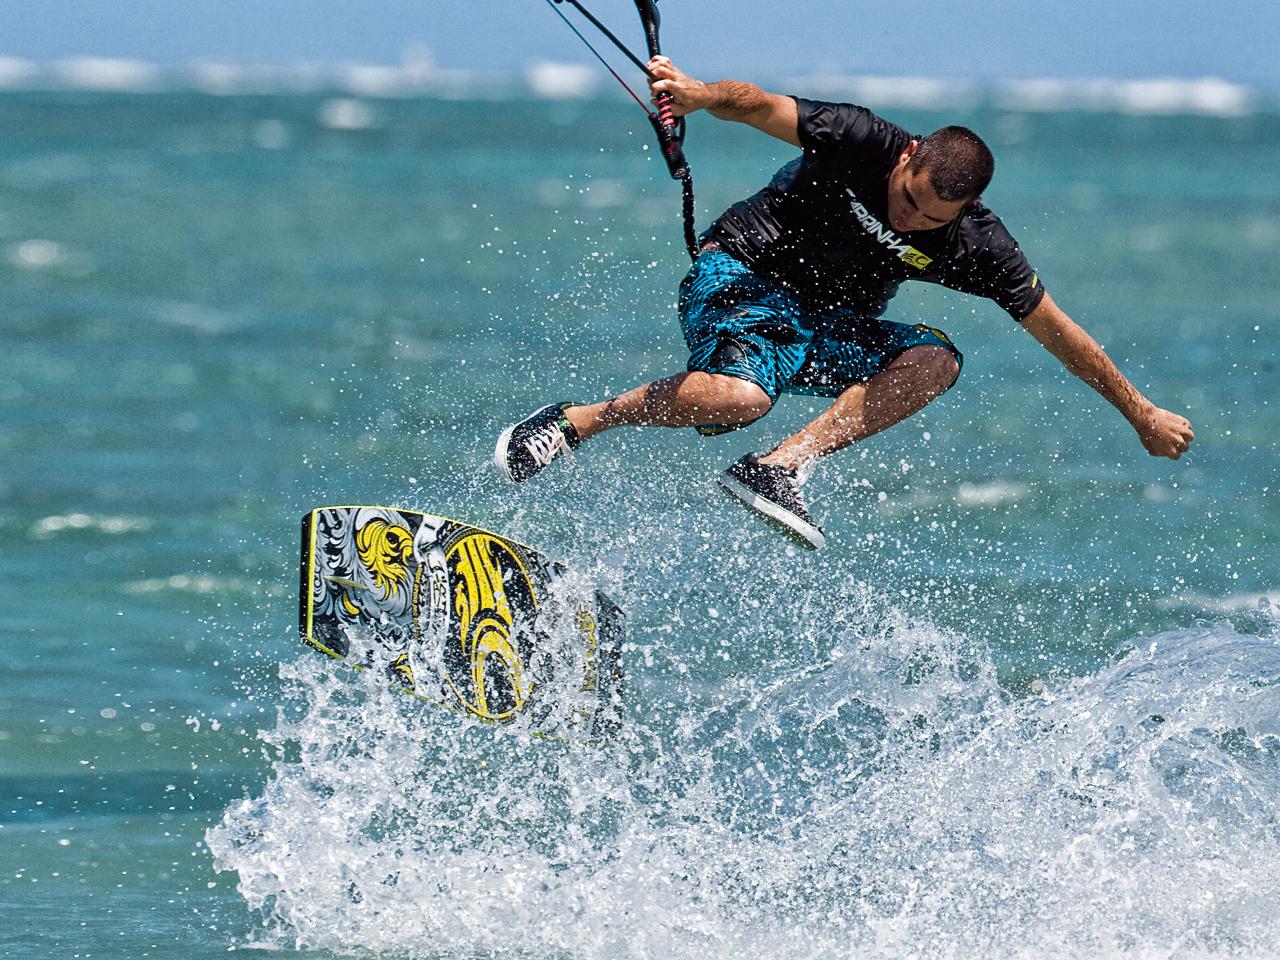 kitesurf wallpaper image - Jason on the wake skate - in resolution: Standard 4:3 1280 X 960